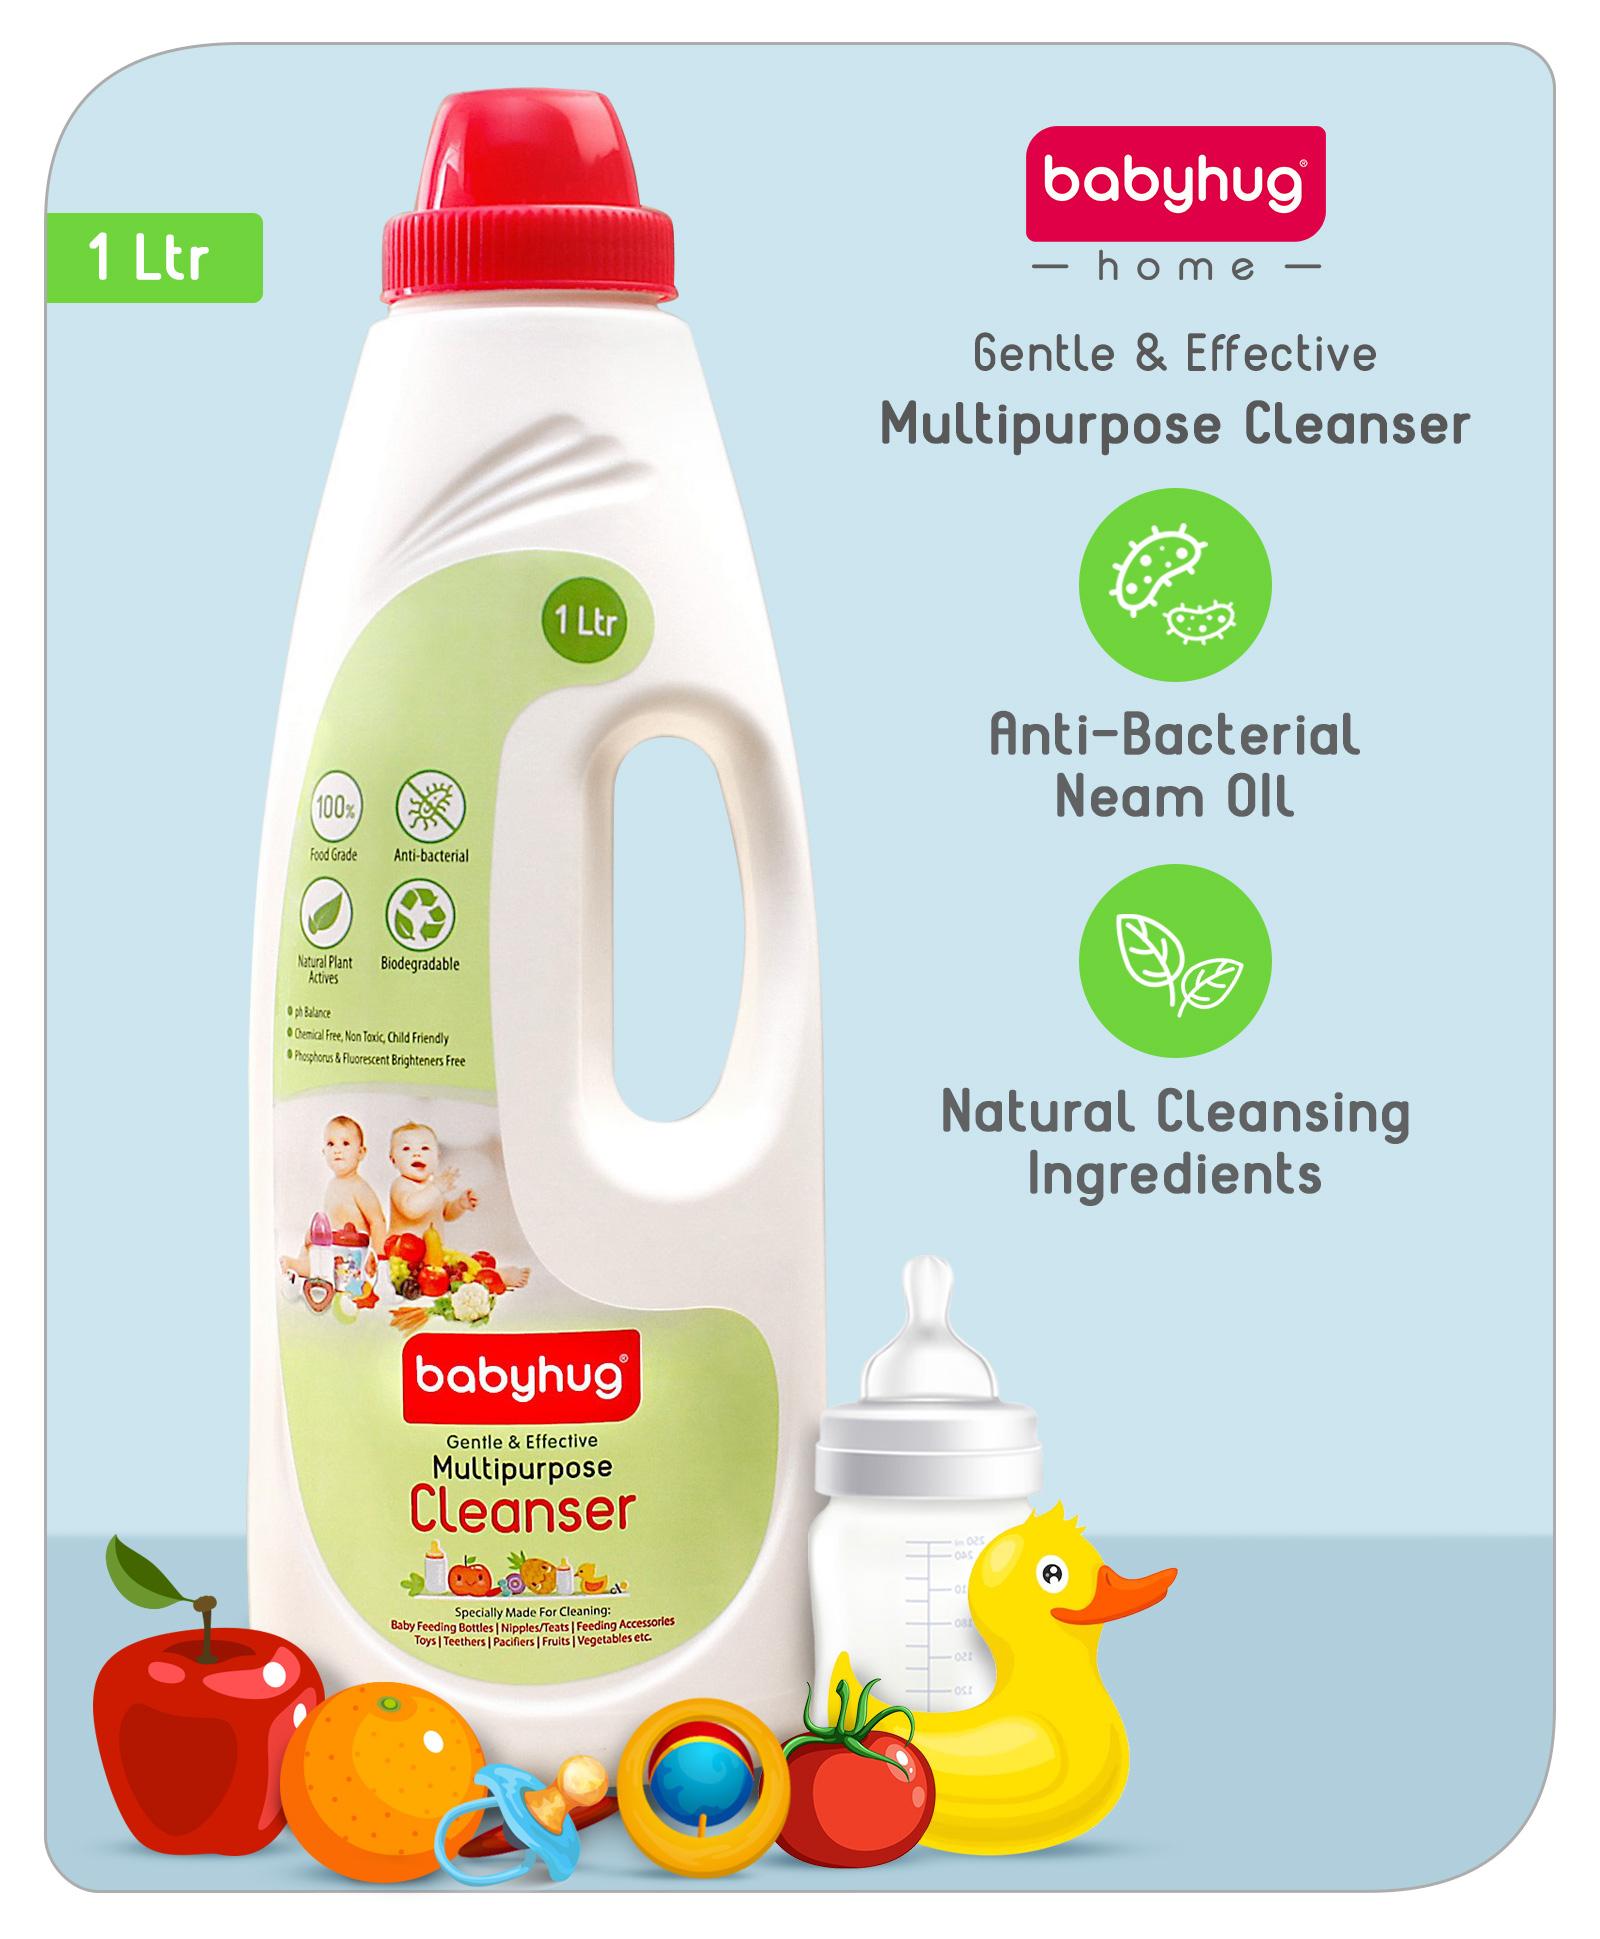 Baby Laundry Detergents Cleaning Liquids Online In India Buy At Dispenser Pureit Classic 9 Liter Cd Babyhug Feeding Bottle Accessories Vegetables Liquid Cleanser 1000 Ml